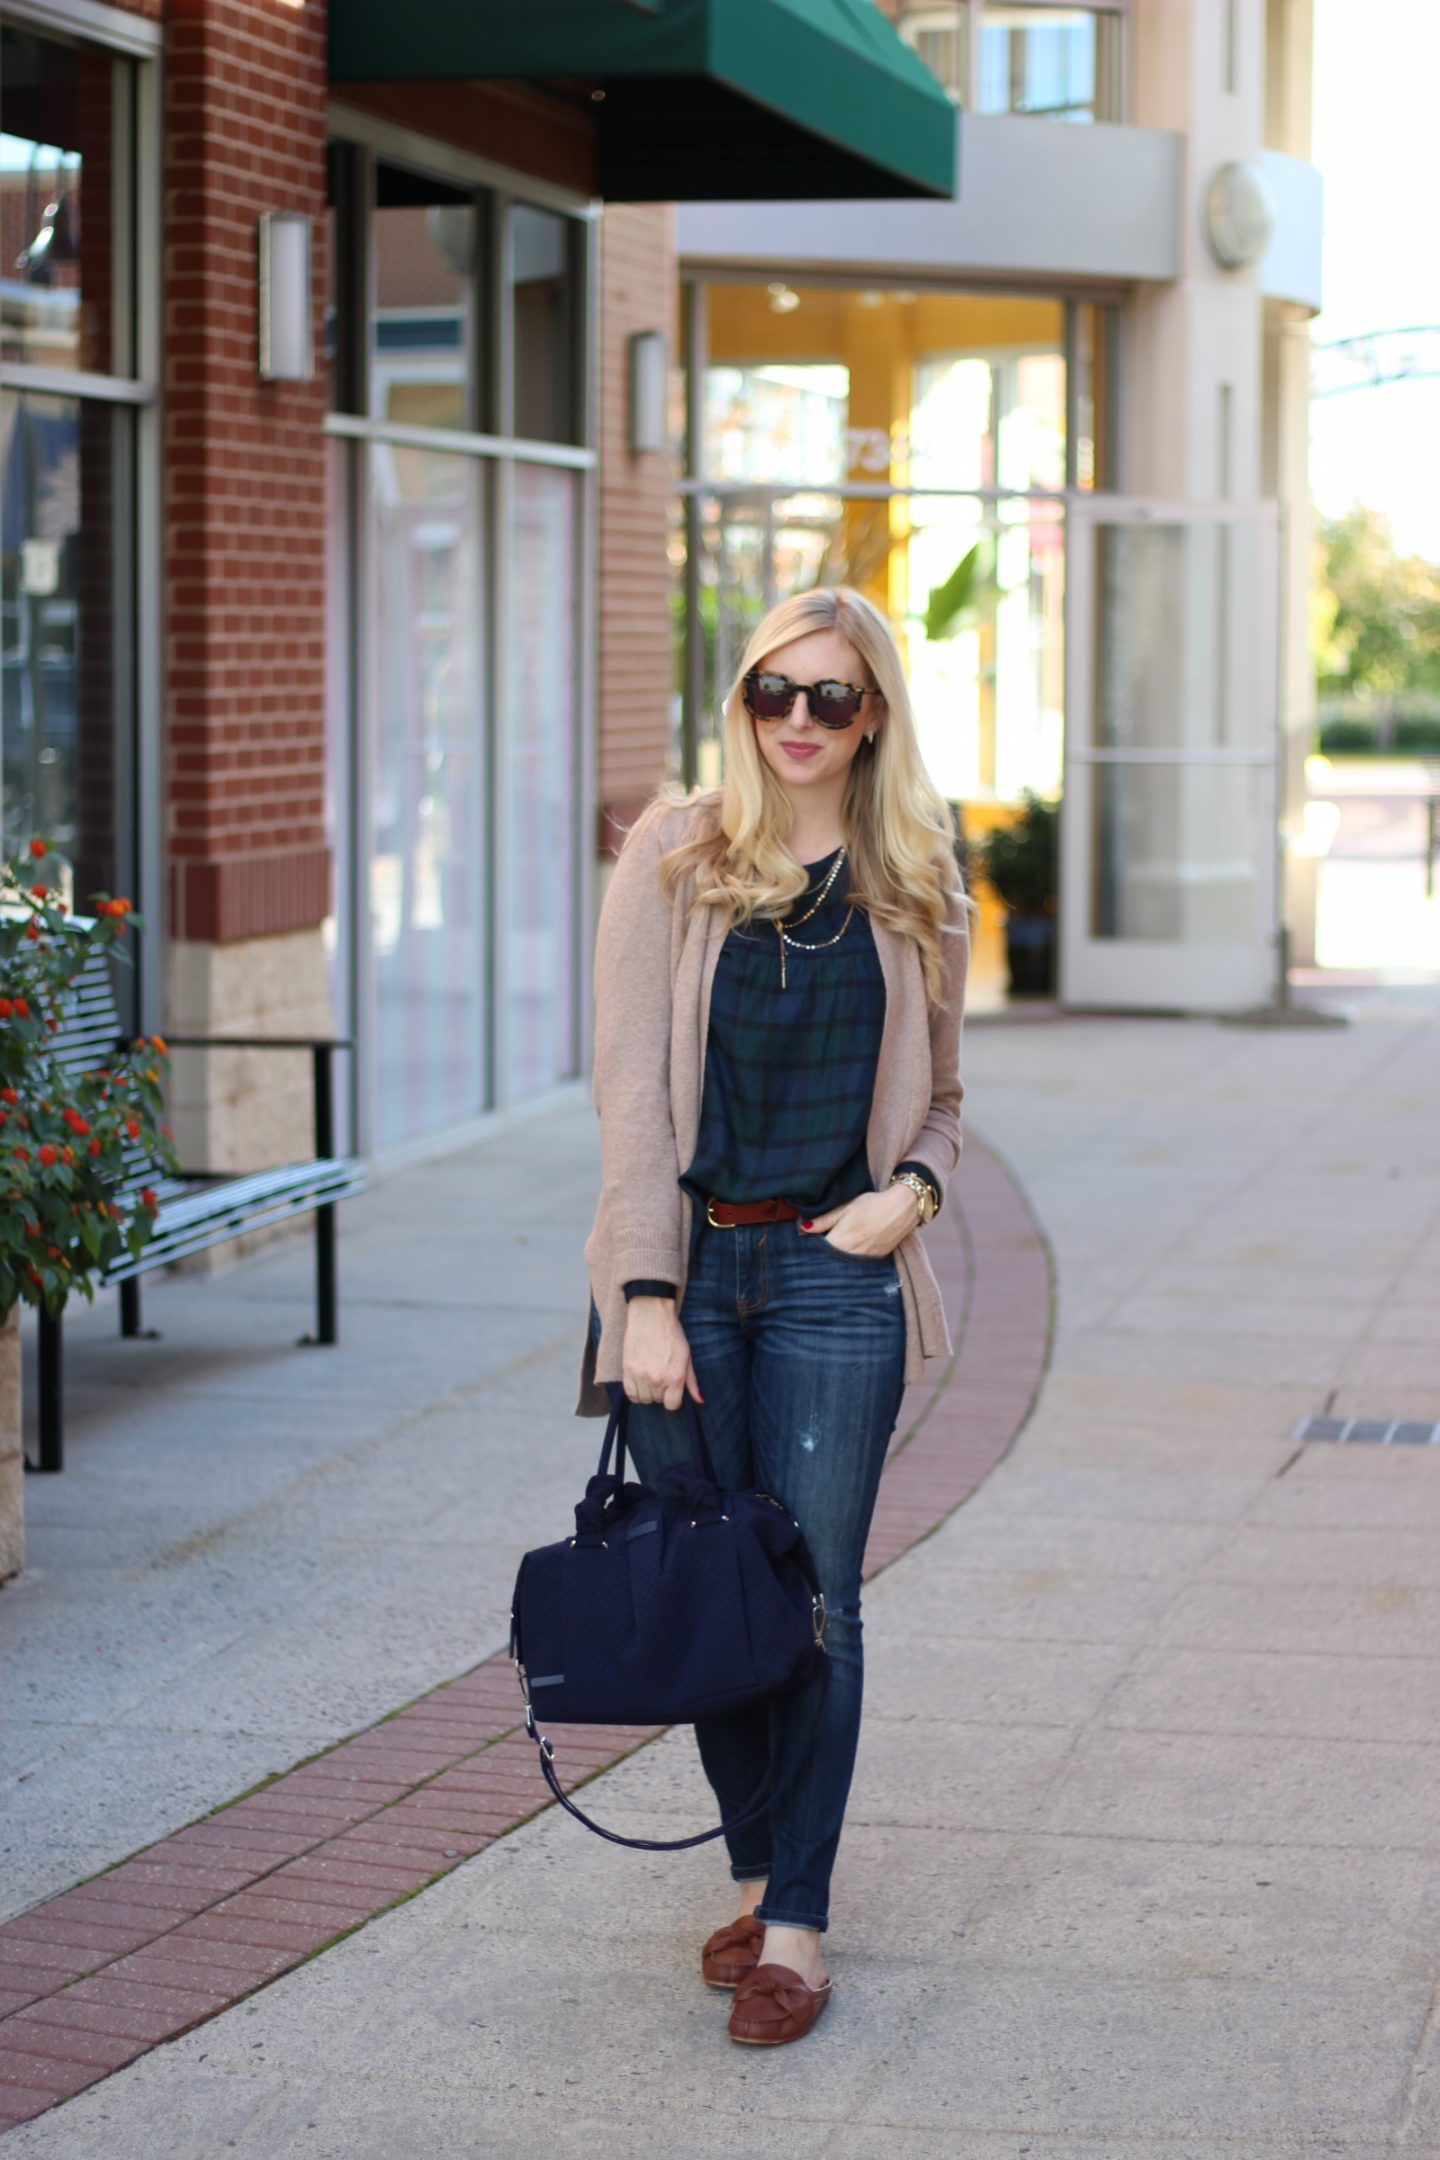 Blackwatch Plaid with a Cozy Cardigan by Washington DC fashion blogger Styled Blonde